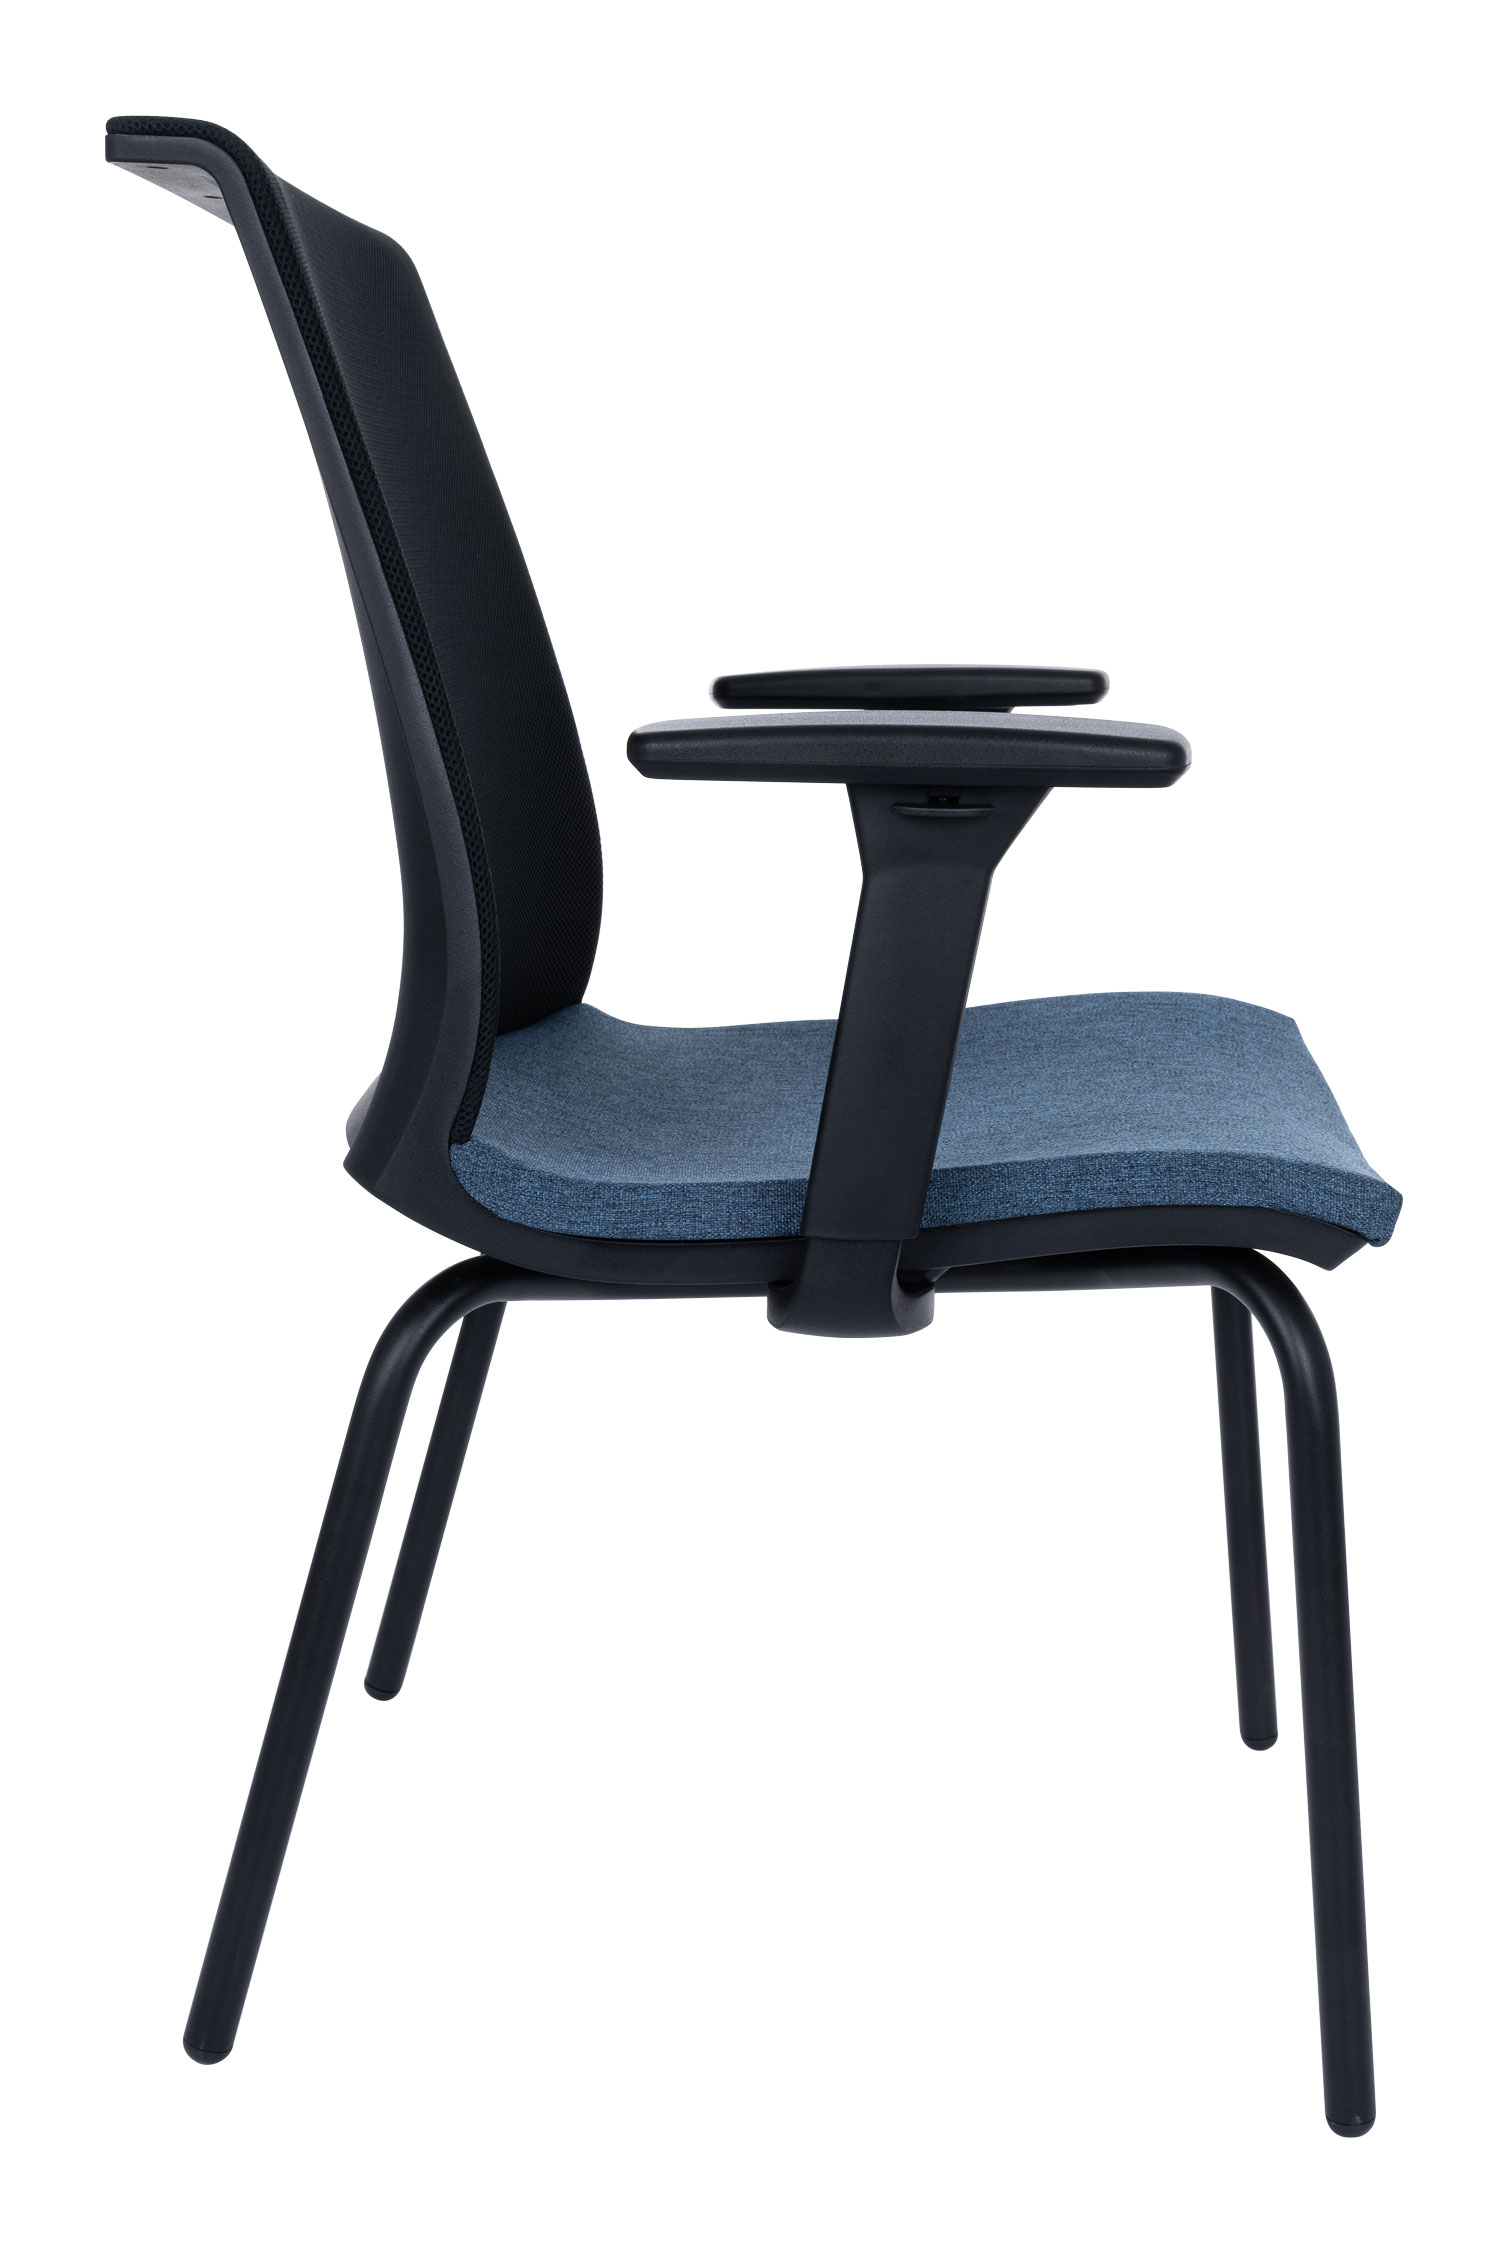 Krzesło Level 4L BS R1 Medley MD13